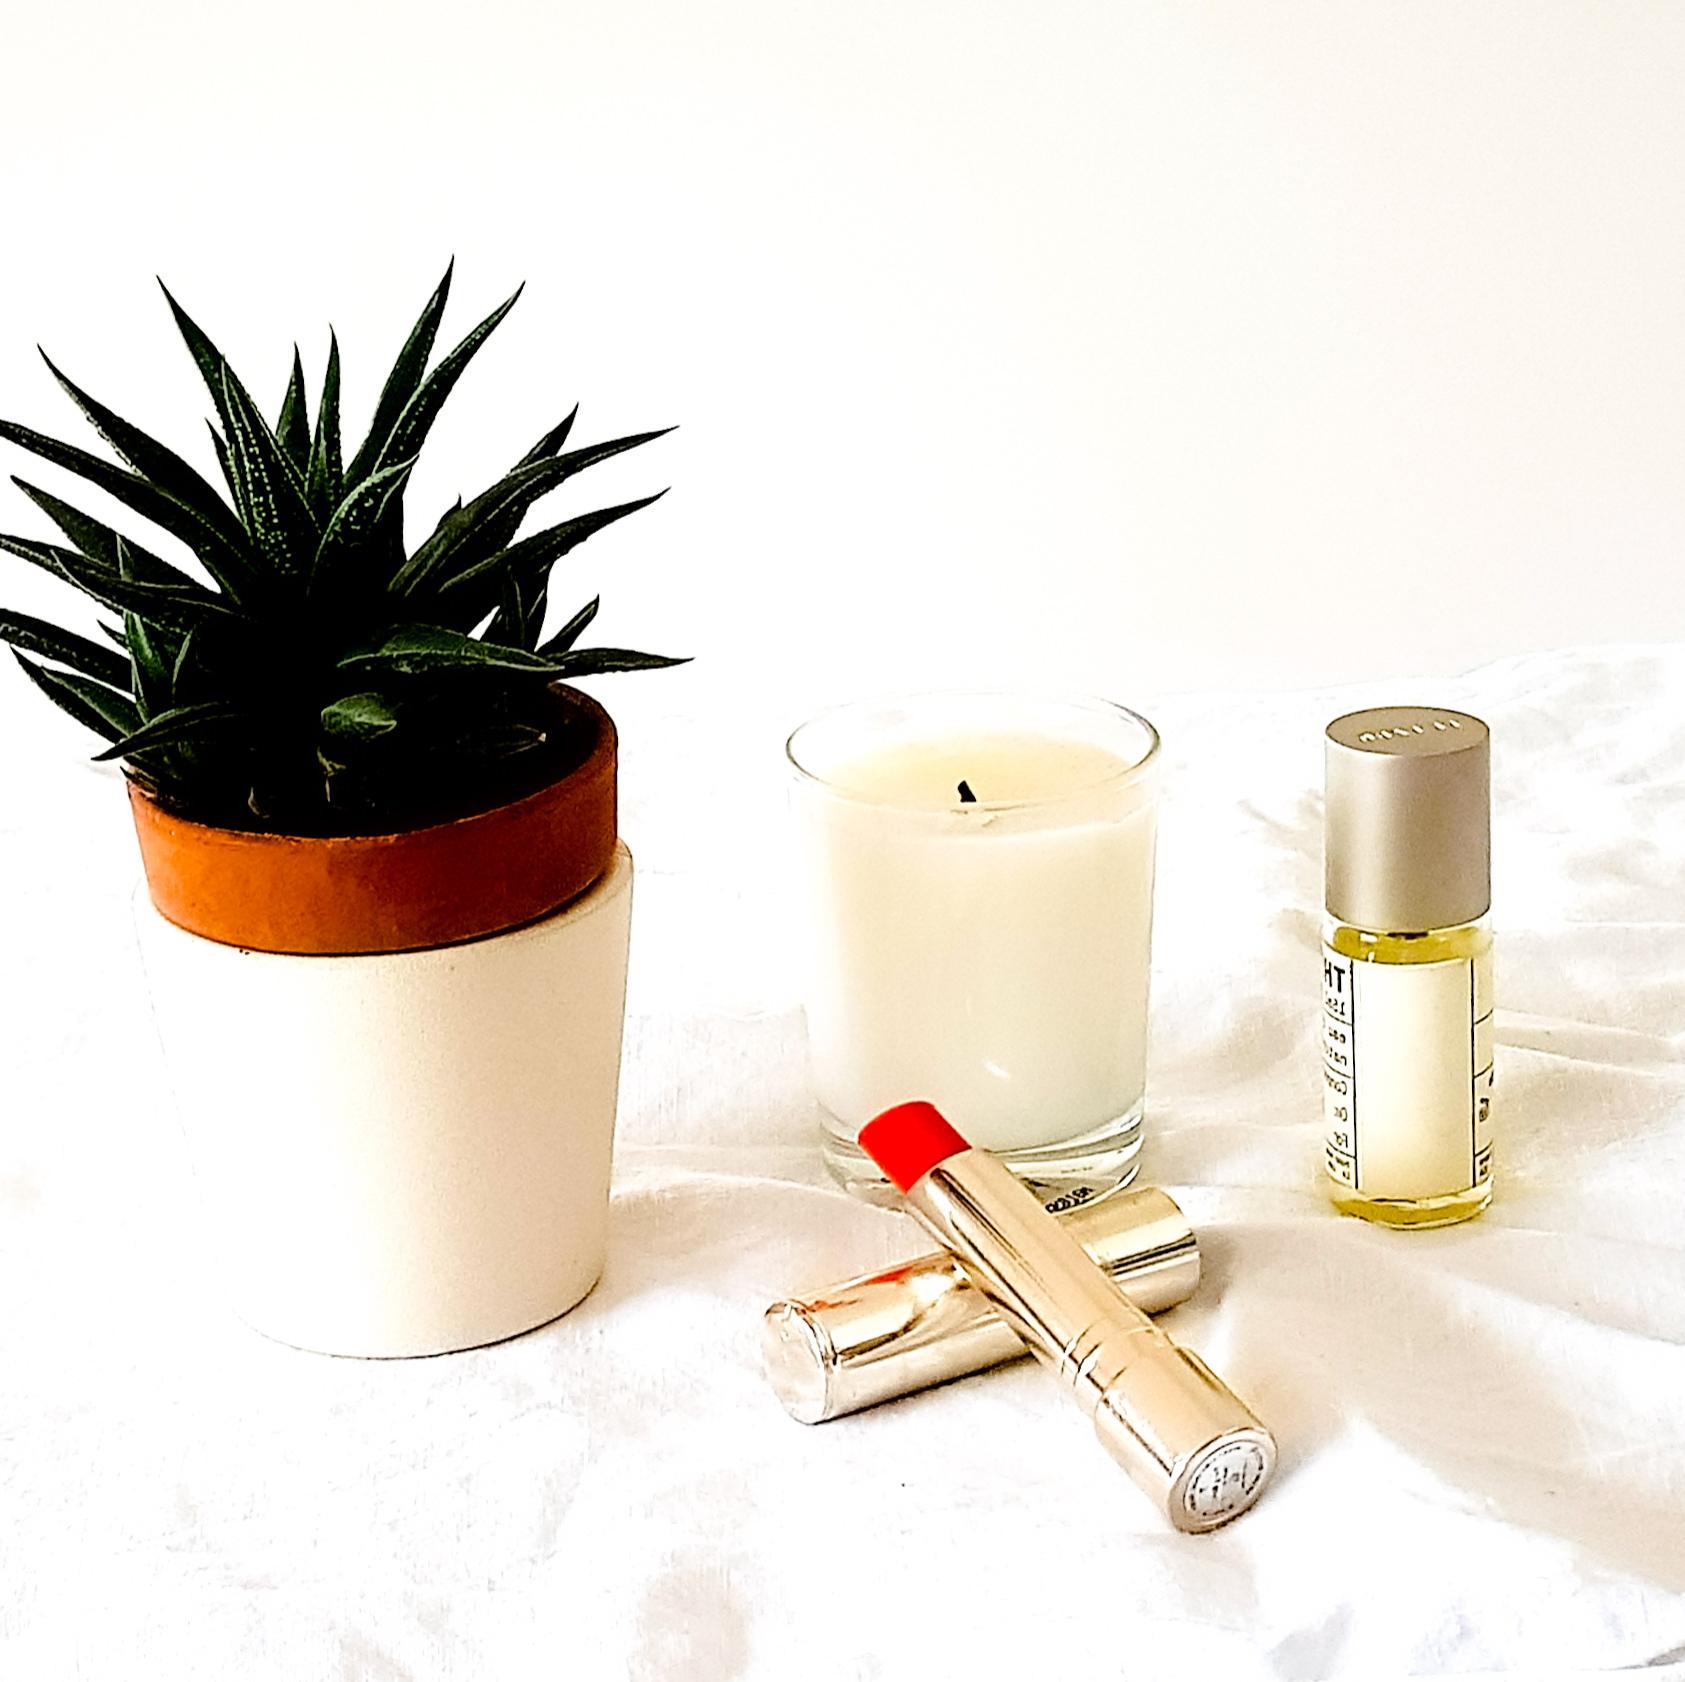 A starter guide to minimalist beauty